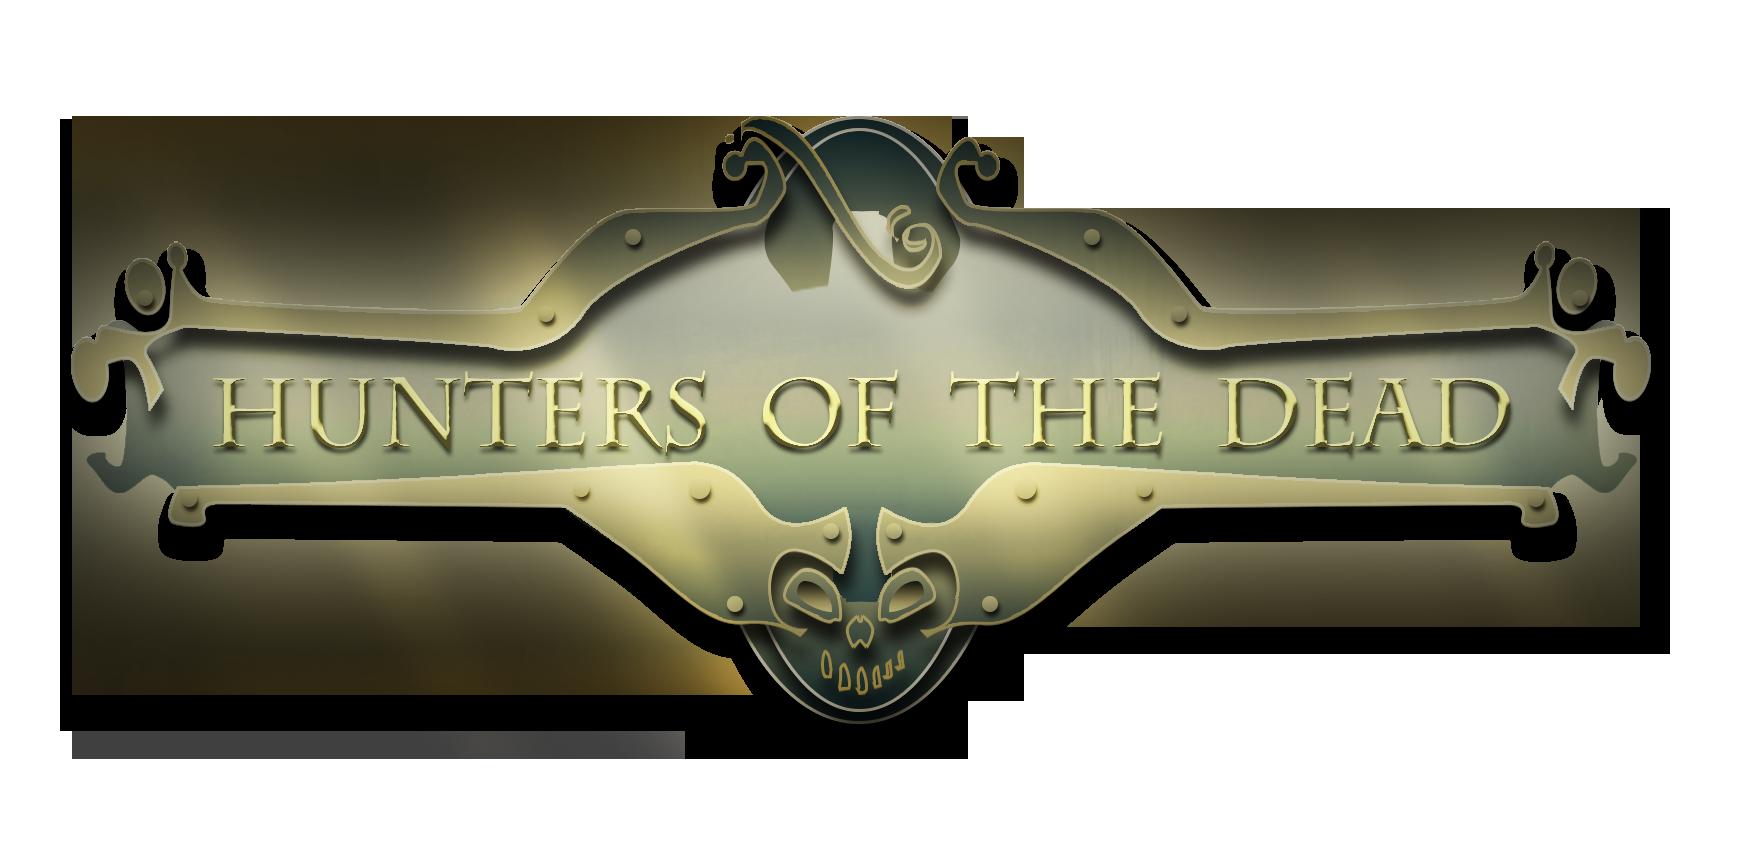 Hunters Of The Dead HD wallpapers, Desktop wallpaper - most viewed